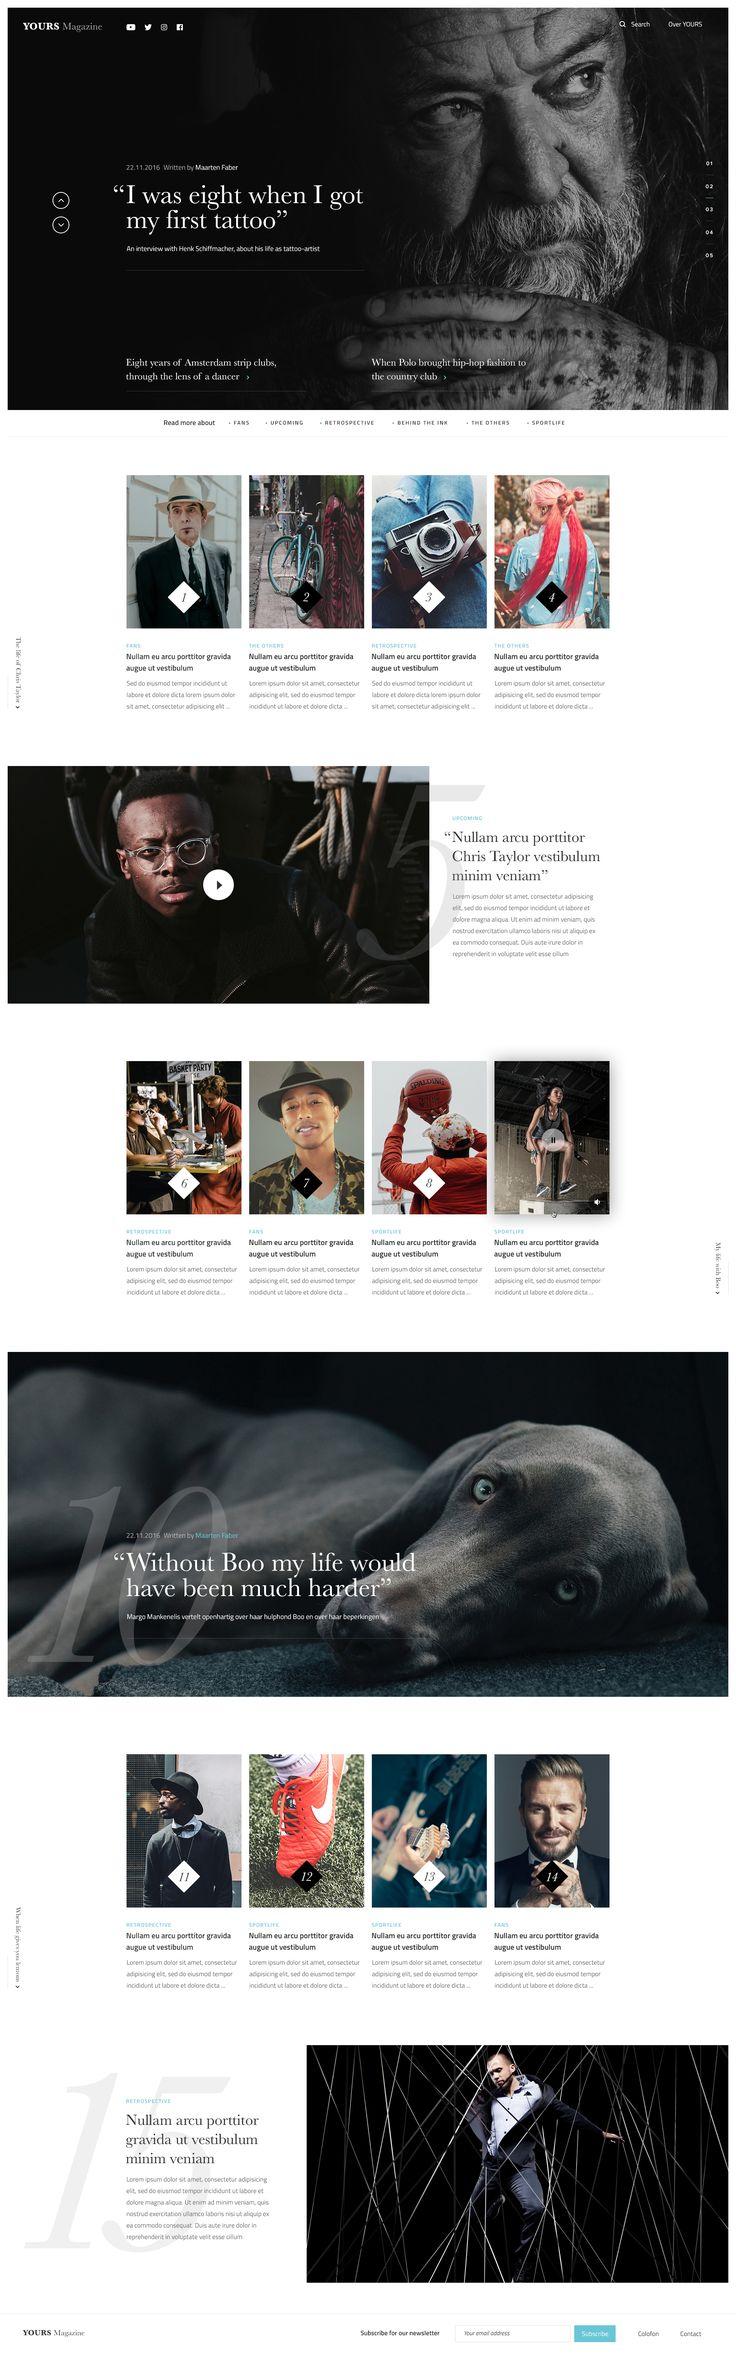 Magazine homepage - Ui design concept exploration by Bart Ebbekink.